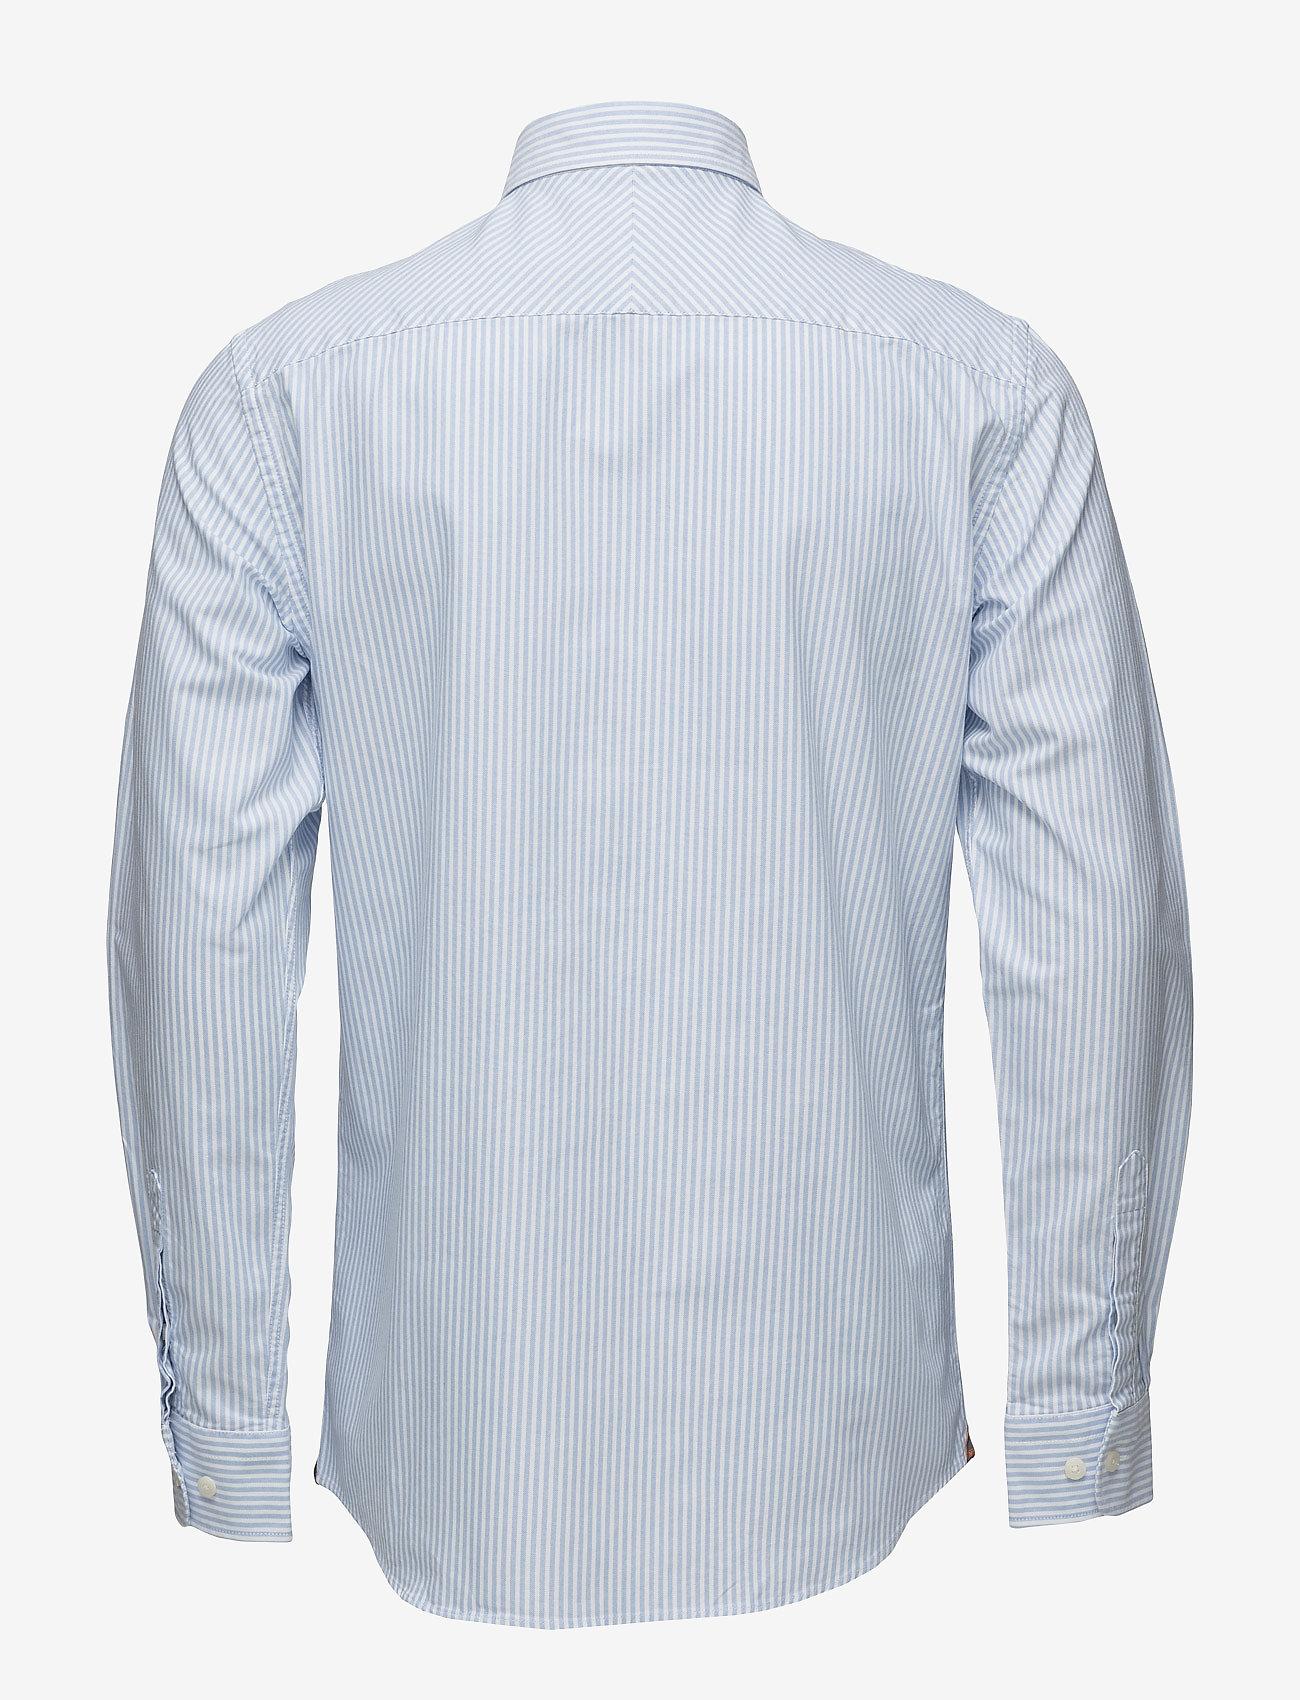 Oxford Striped Button Down (Light Blue) (99 €) - Morris 0X8gY